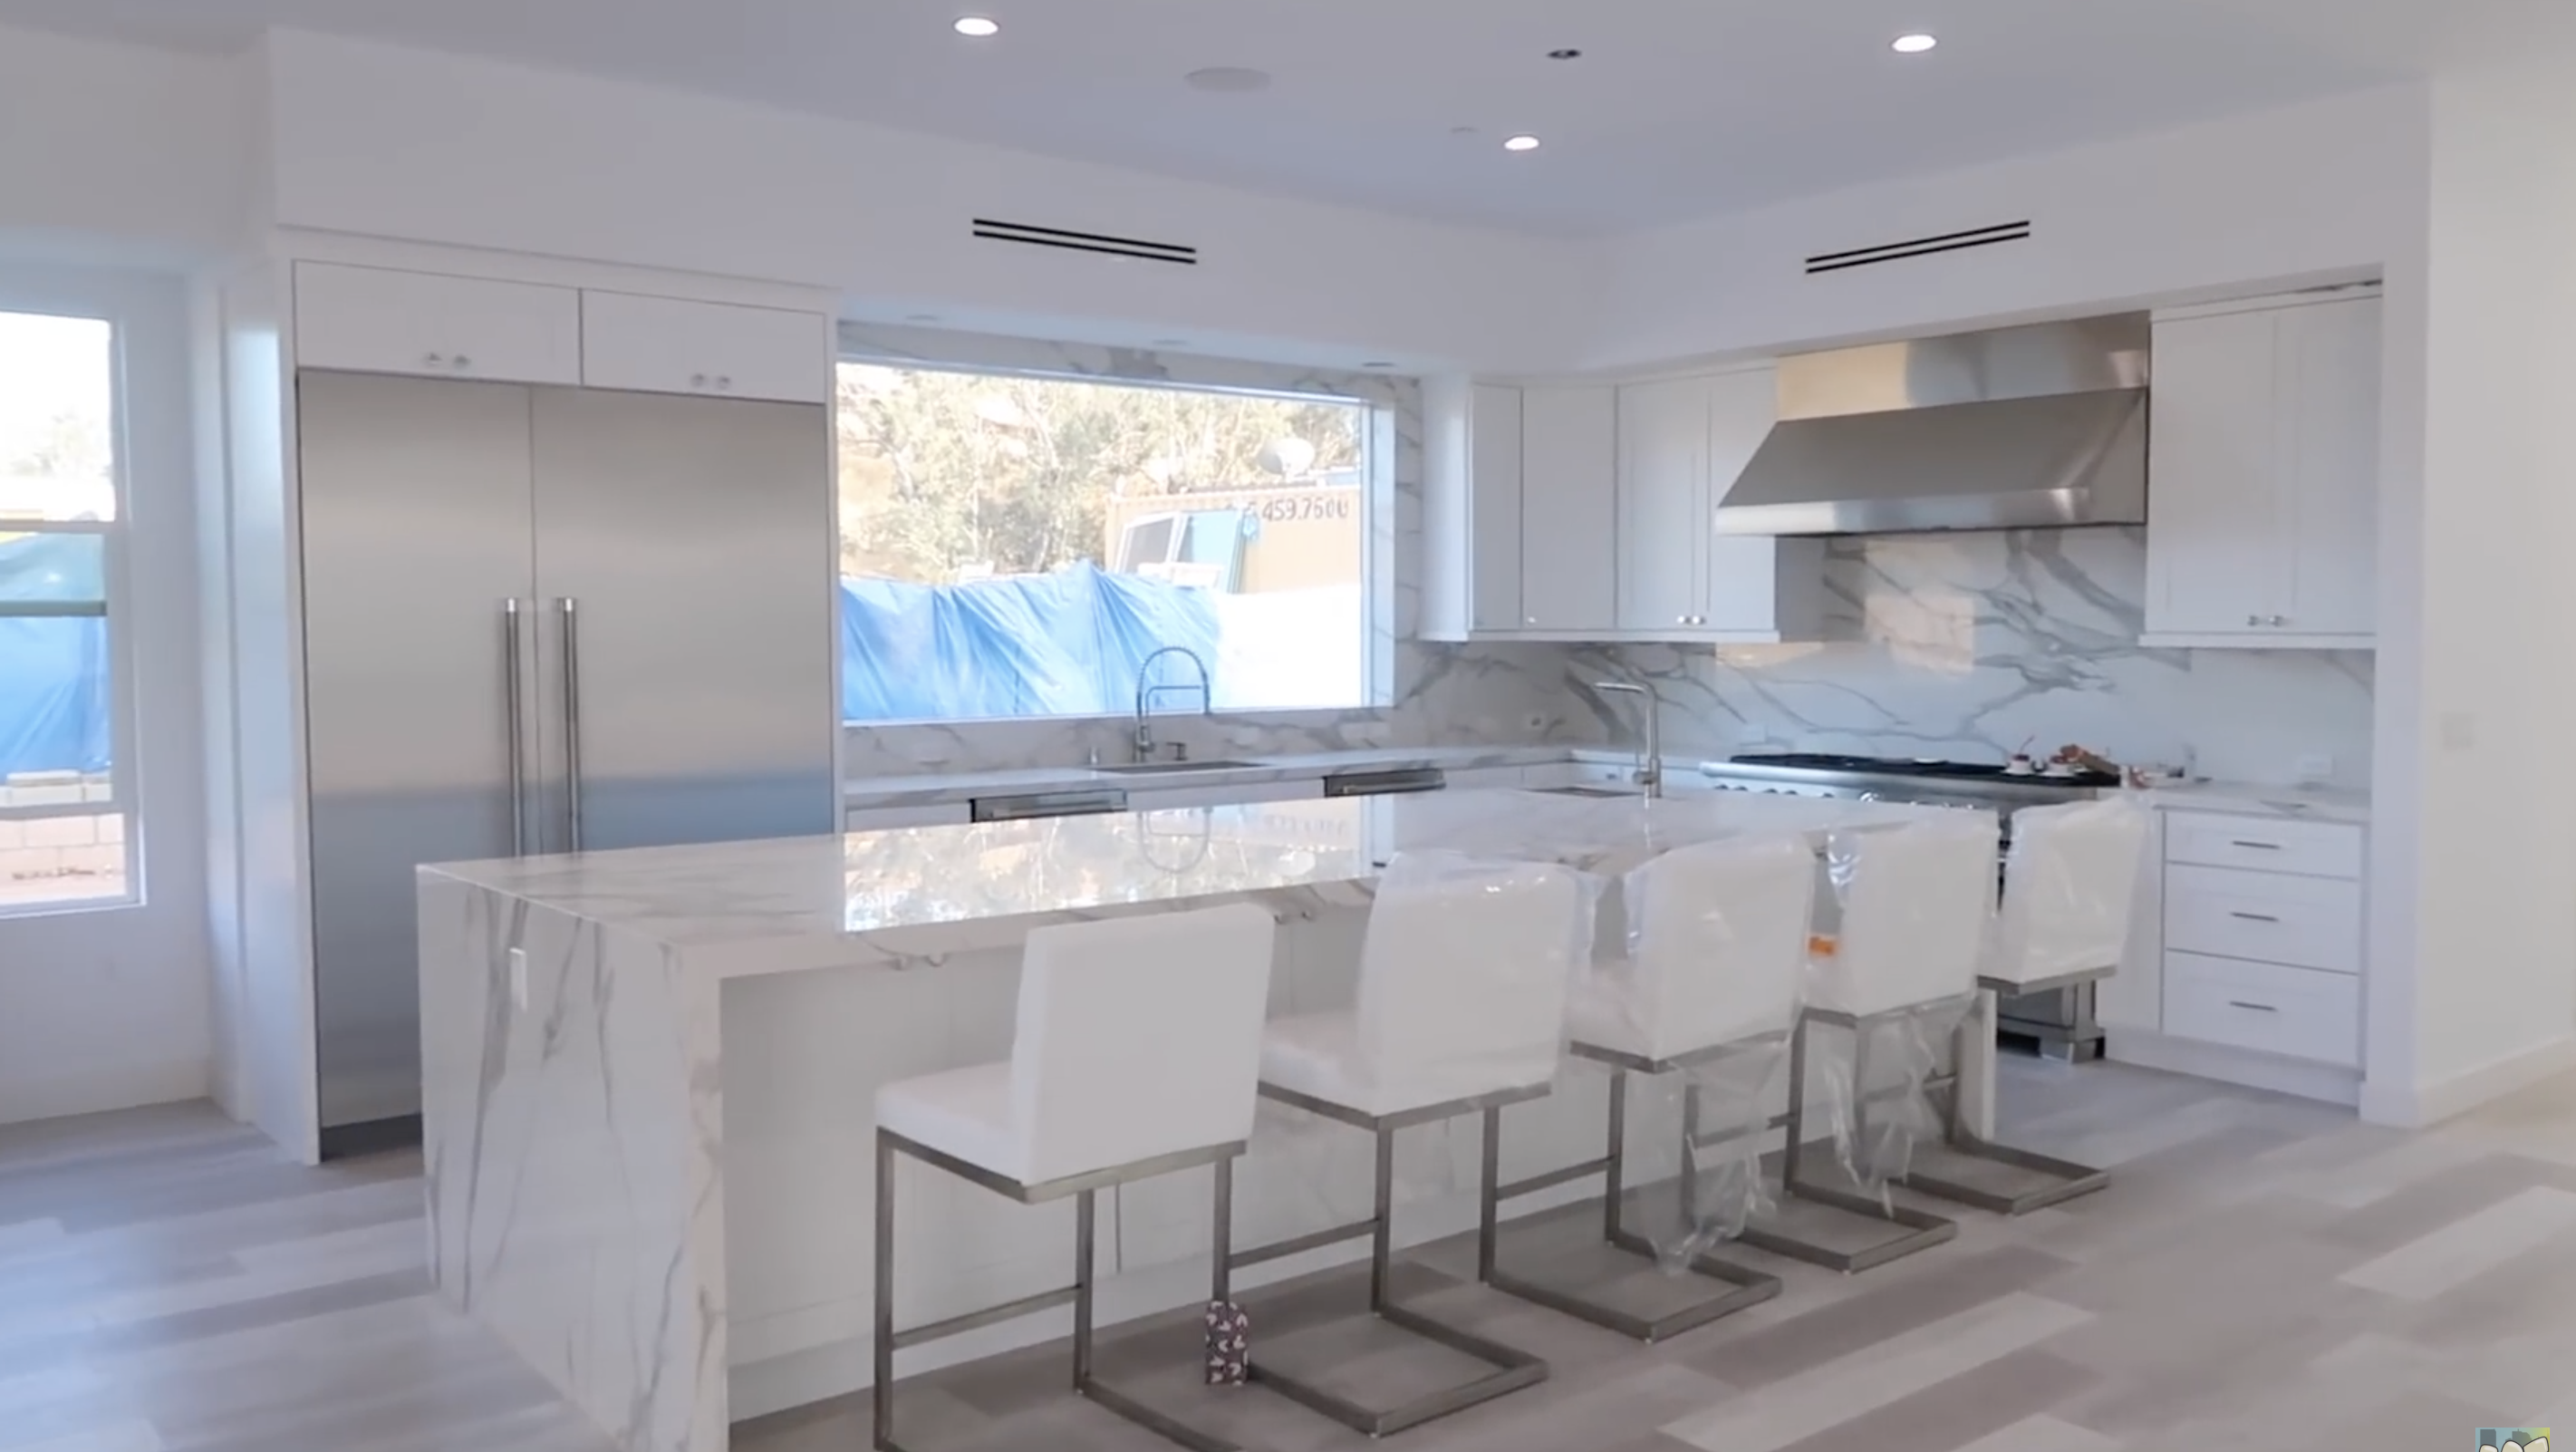 Pin by Myah Avila on Dream house in 2020 Luxury homes